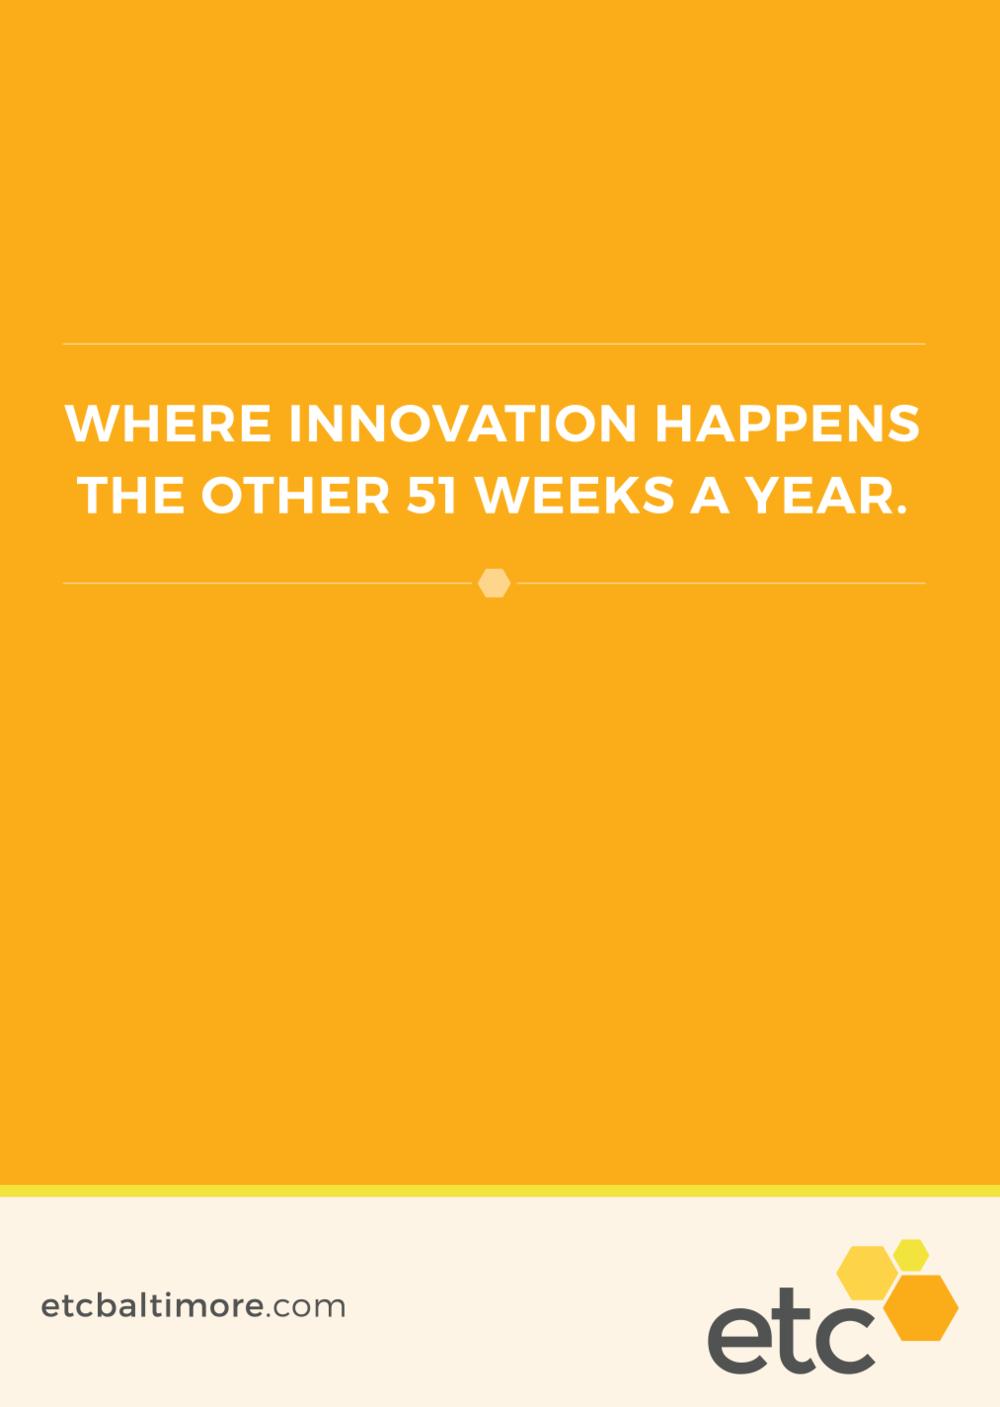 InnovationWeekAdPrintVersion.png